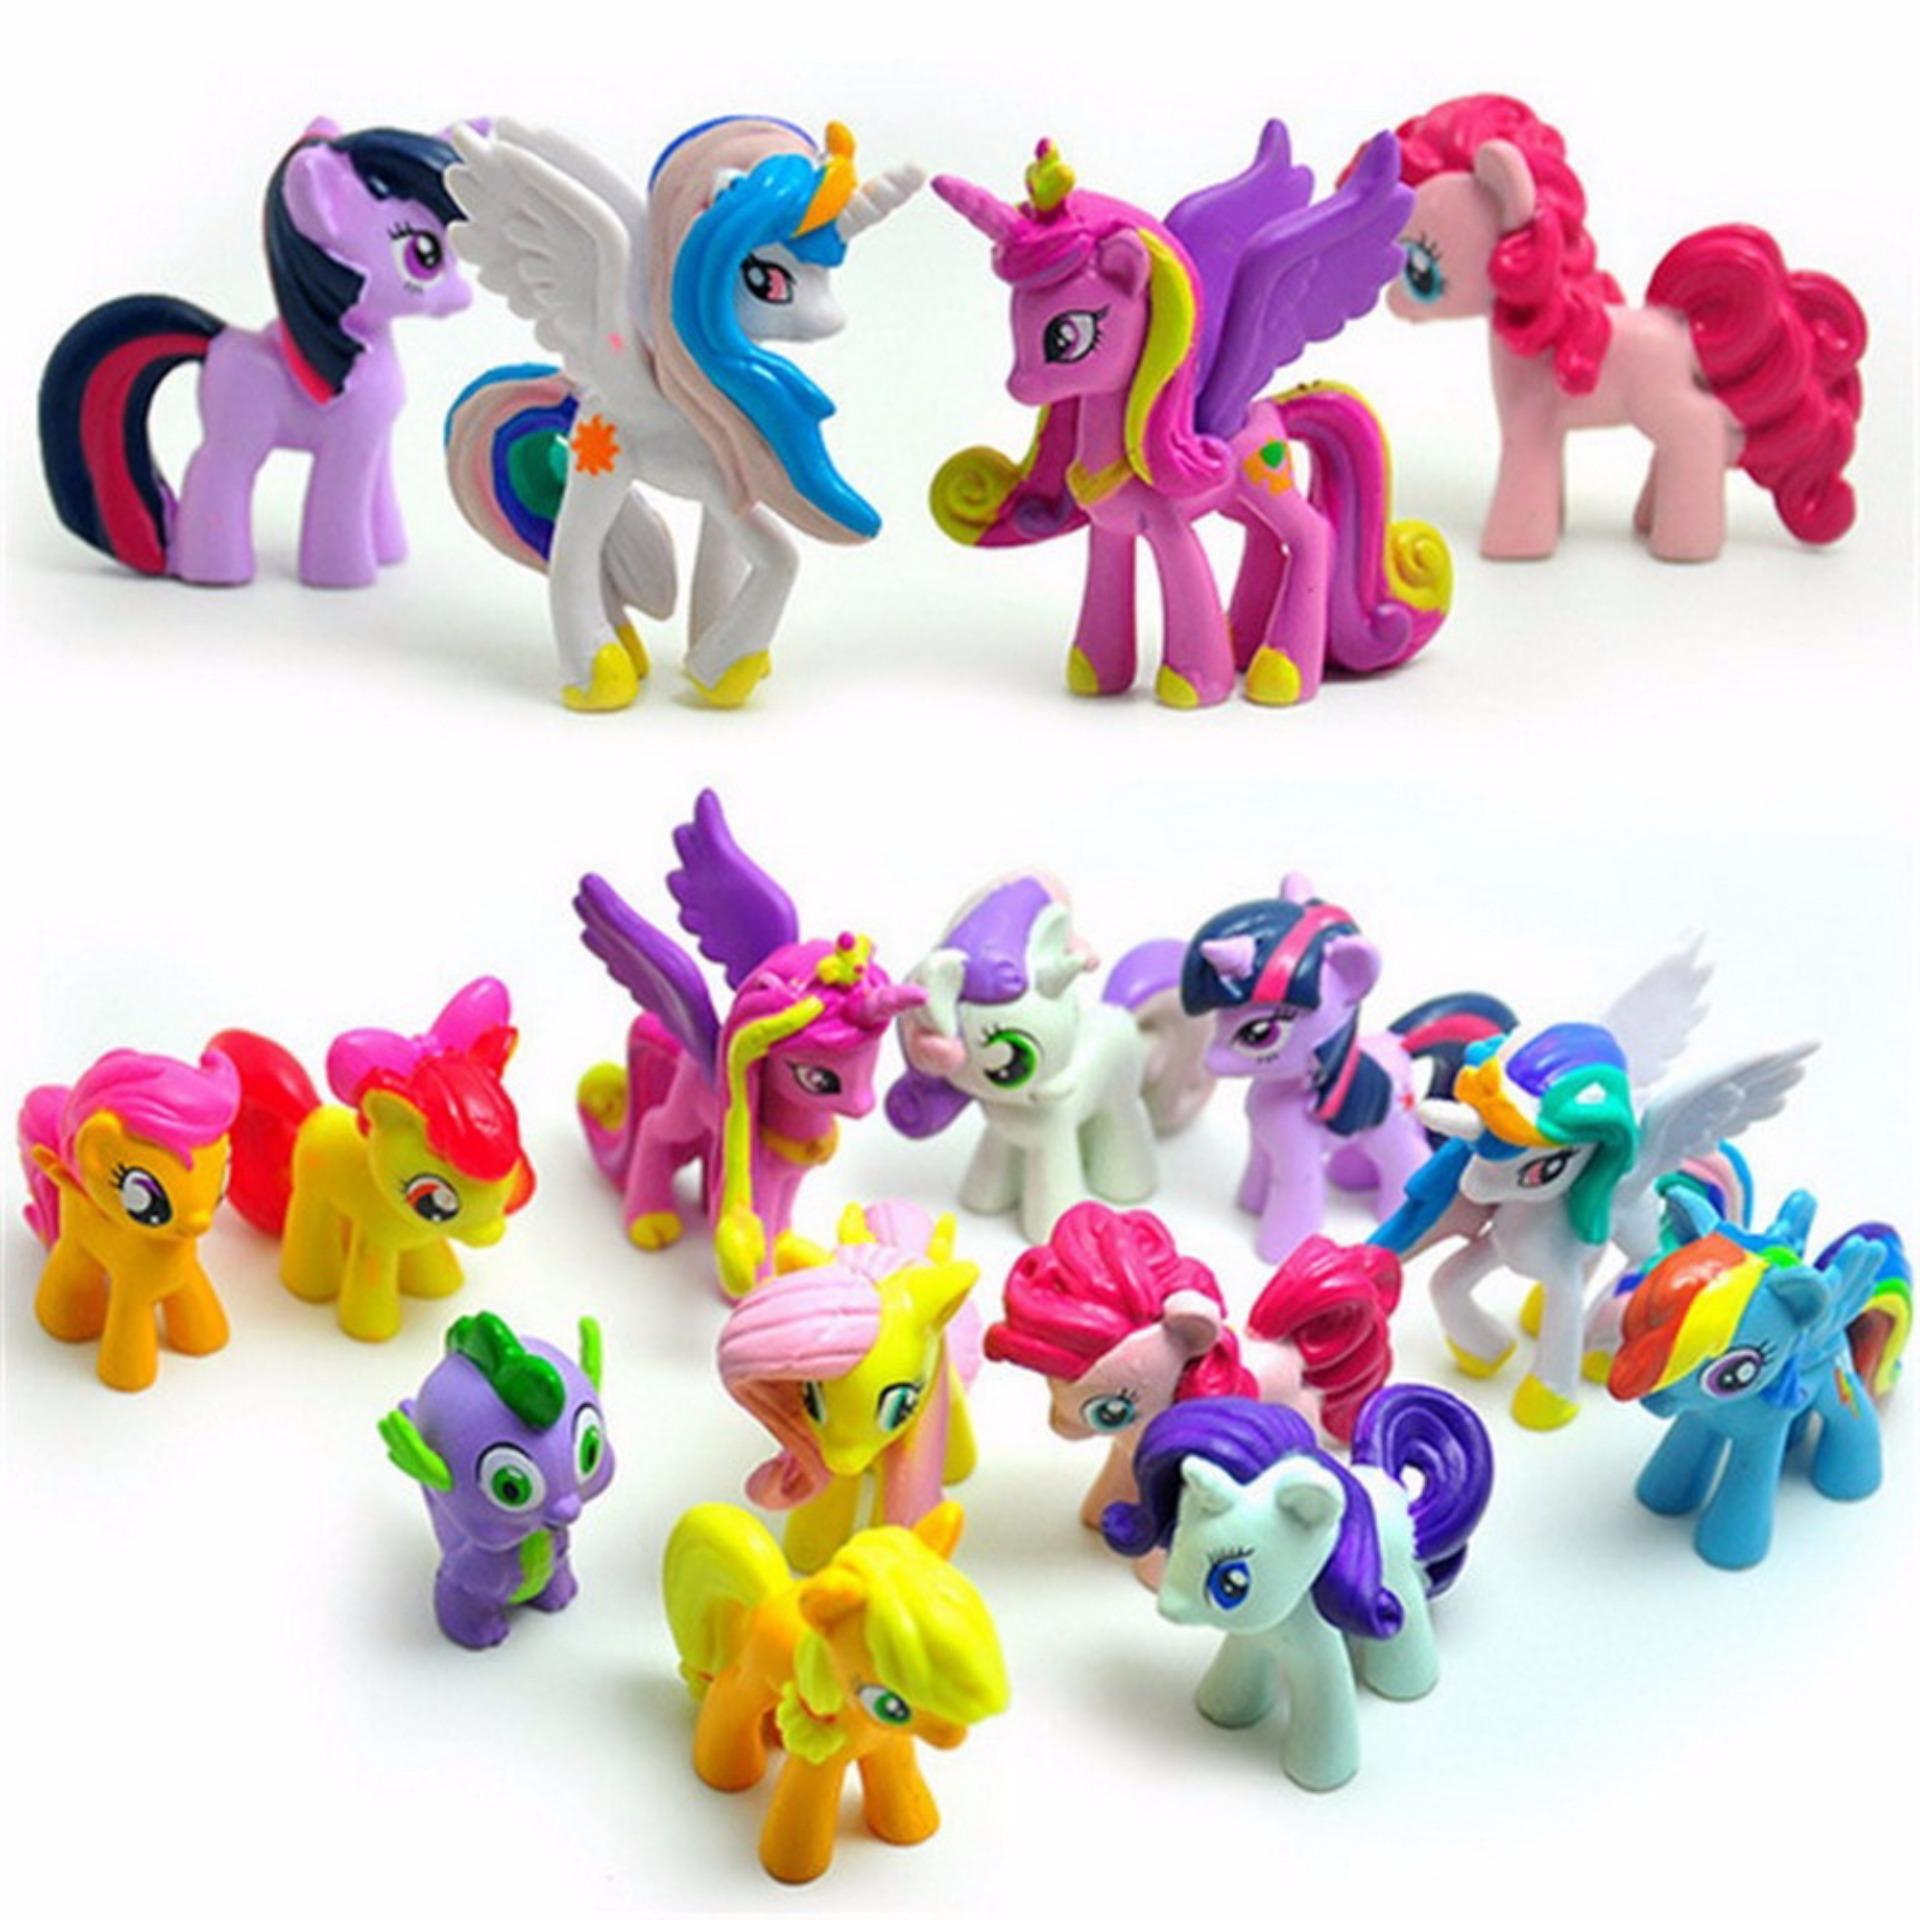 HEMAT My Little Pony Action Figure Set Isi 12 c537dddc10